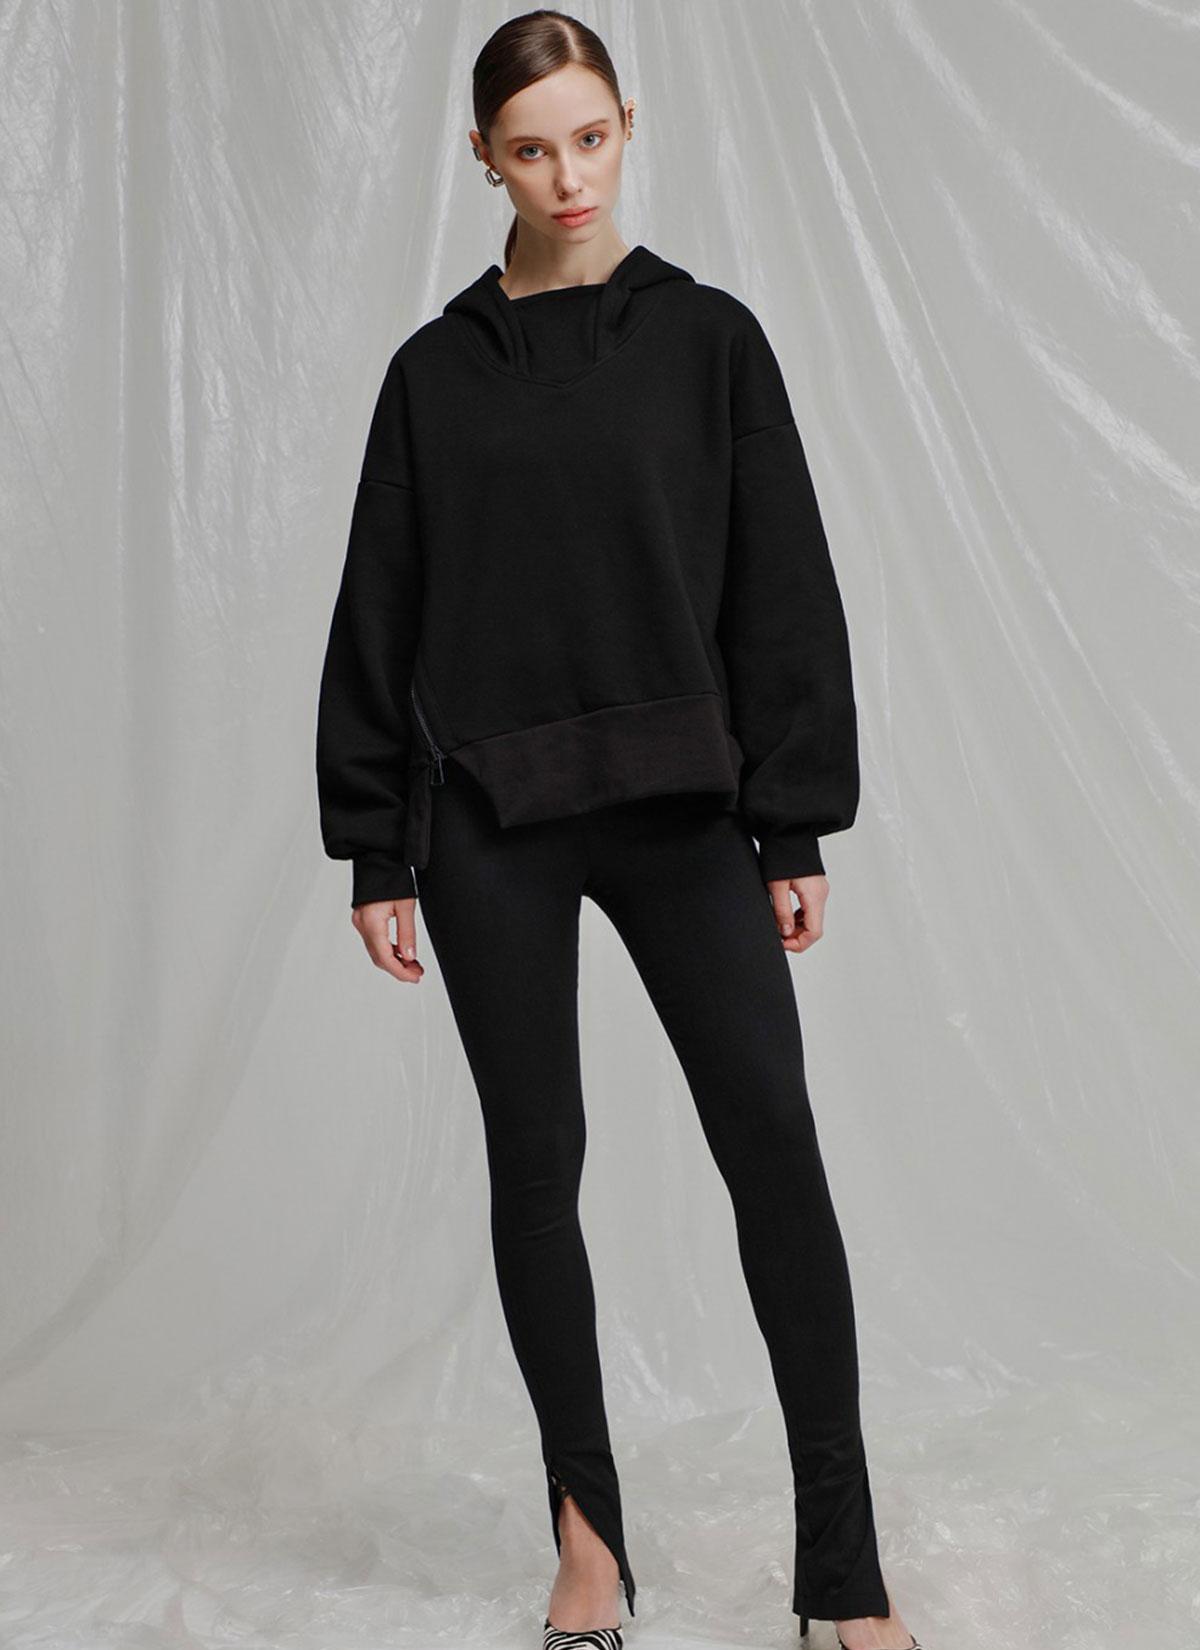 Waking Life Sweatshirt